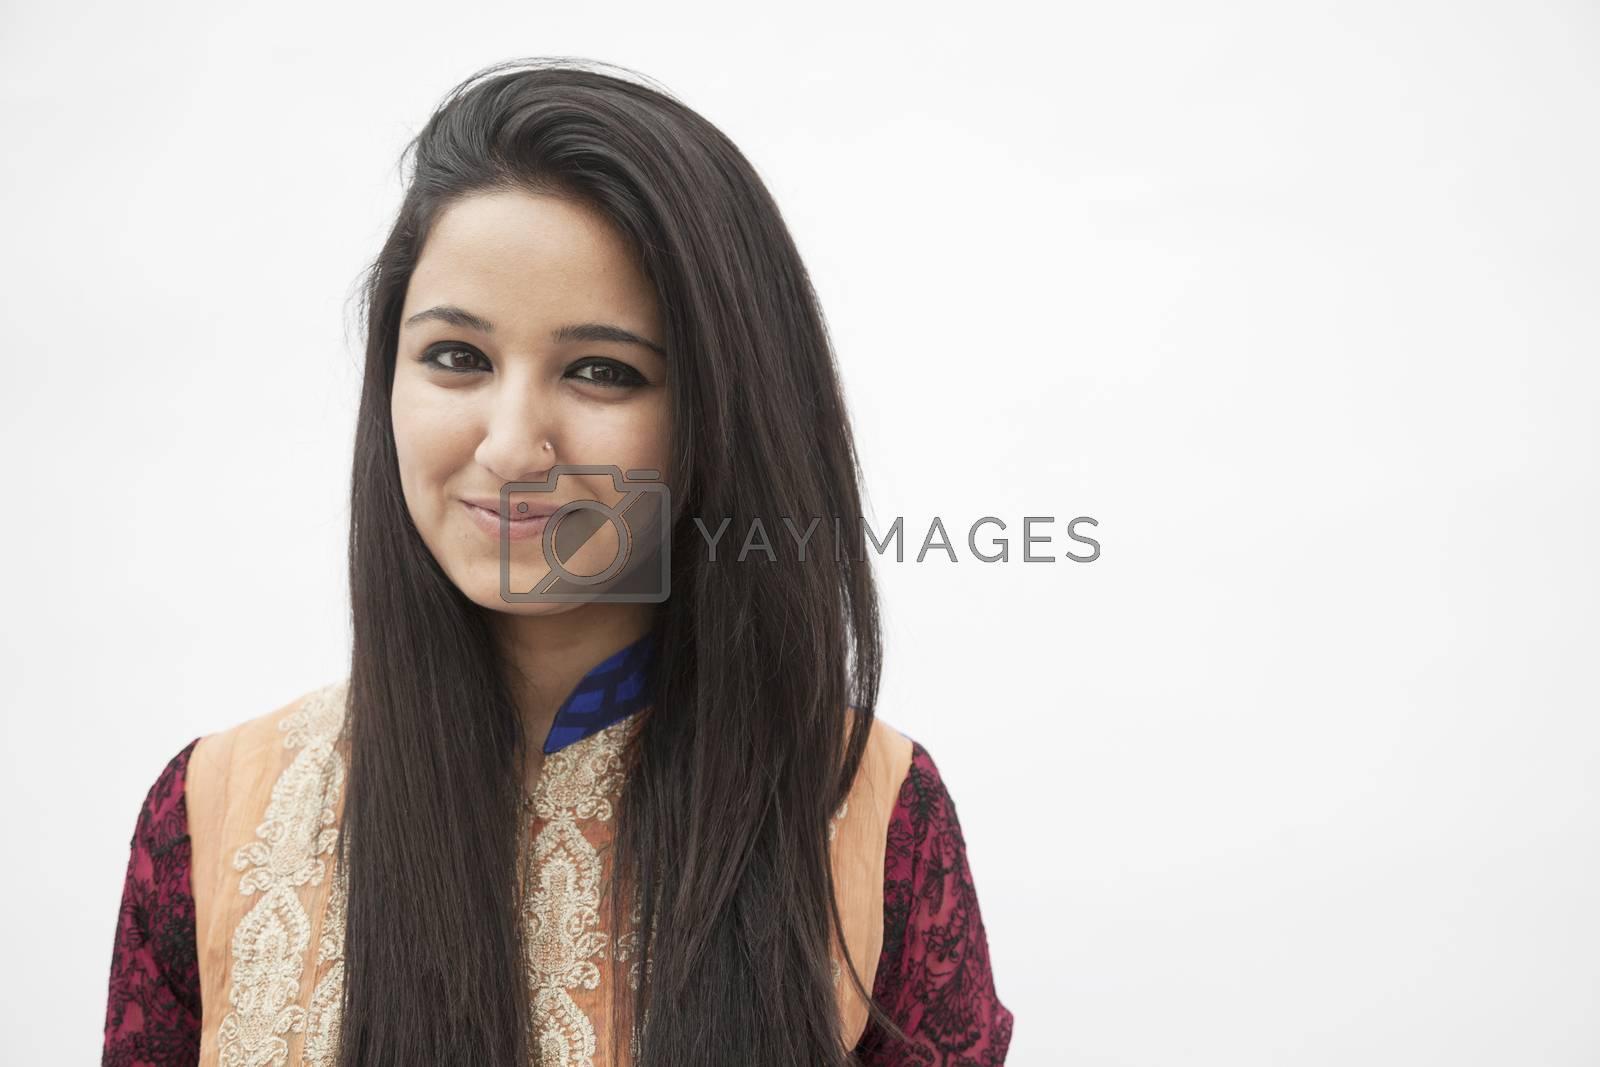 Portrait of smiling young woman wearing traditional clothing from Pakistan, studio shot by XiXinXing